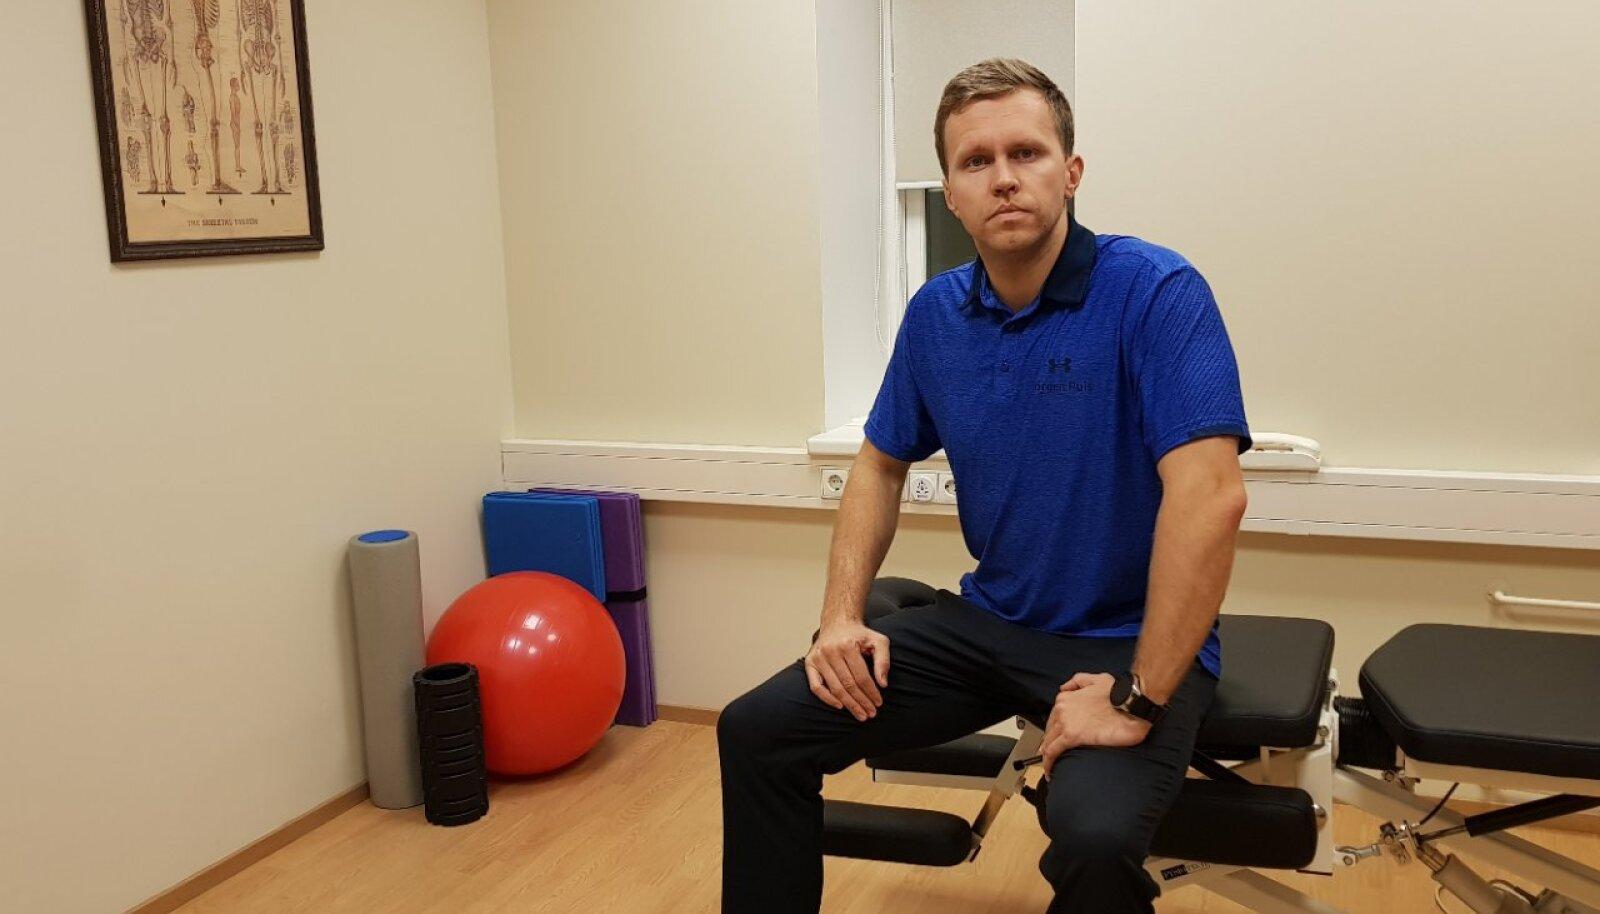 Jörgen Puis, füsioterapeut